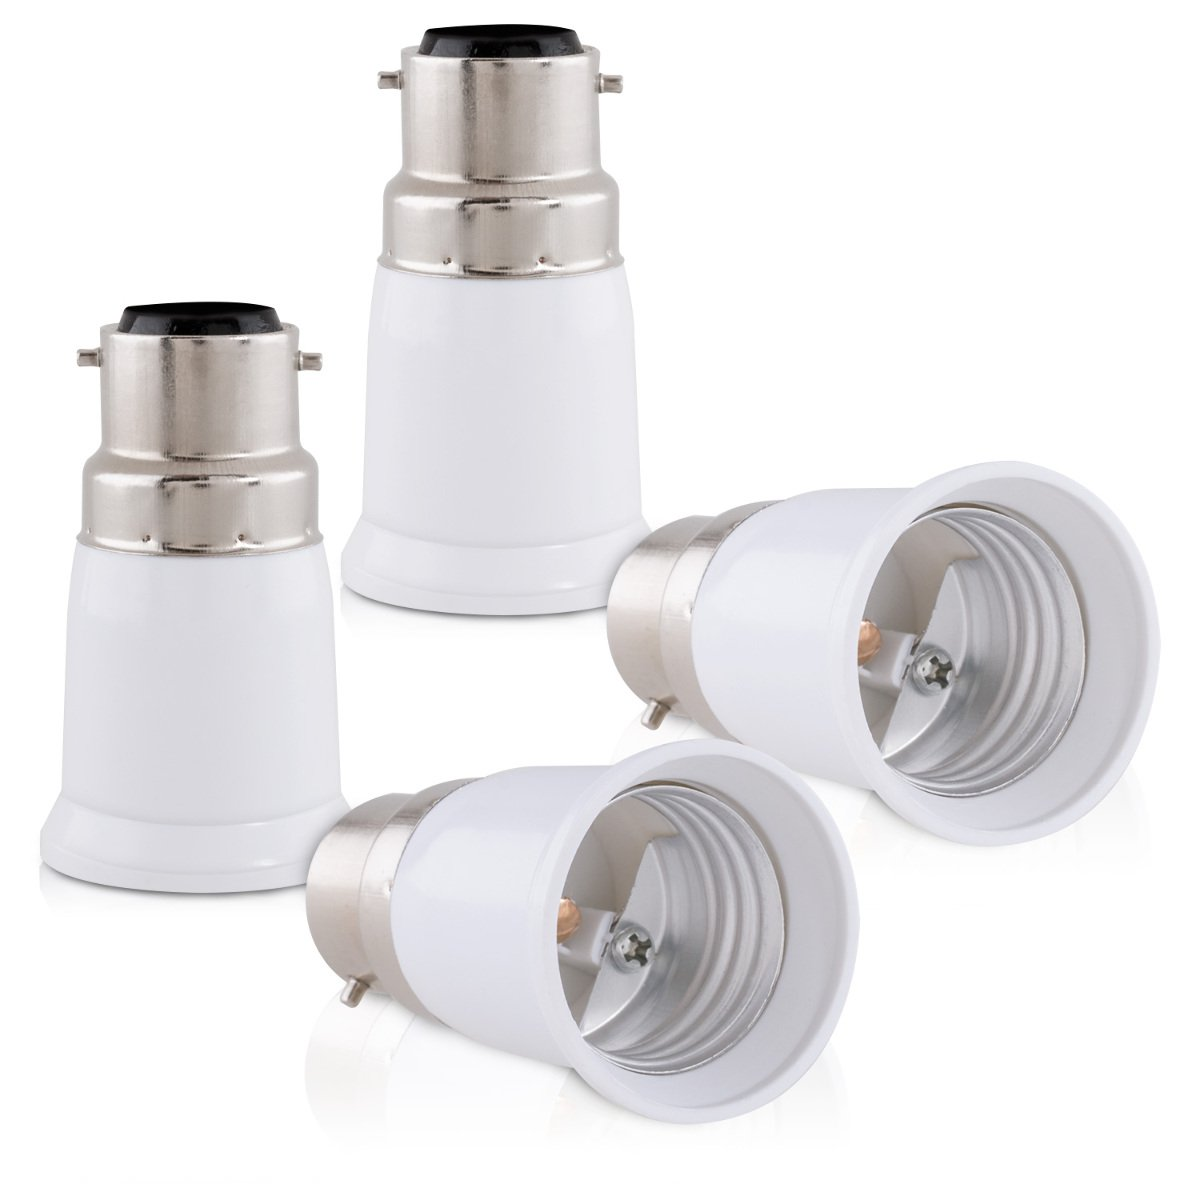 Z/ócalos para l/ámparas LED hal/ógenas y de Ahorro Adaptador conversor de Montura B22 a Casquillo E27 kwmobile 4X Casquillos de l/ámpara